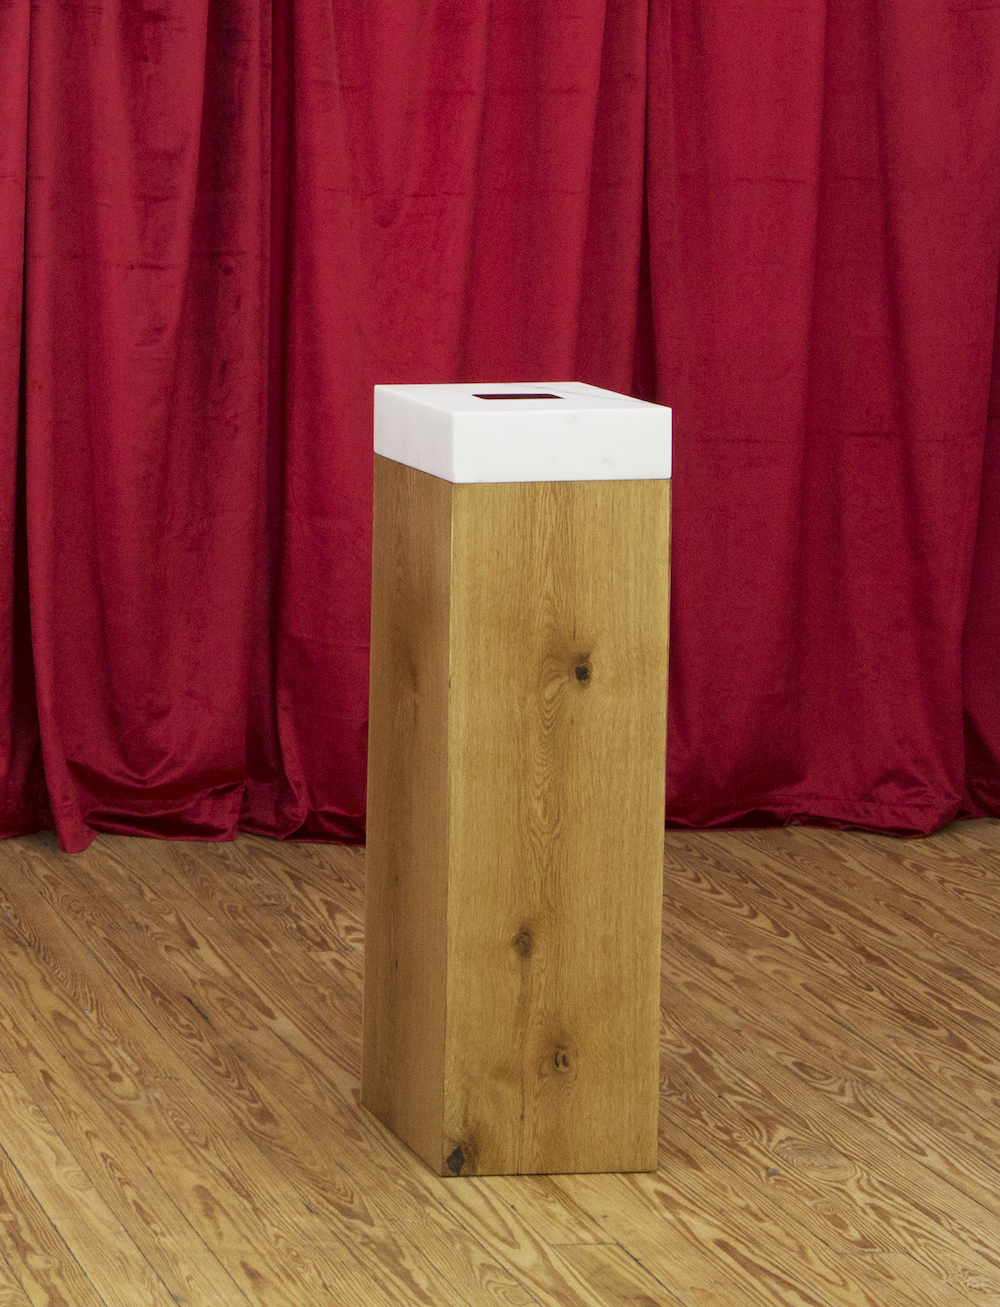 Proposal for a Romantic Sculpture,  2012.